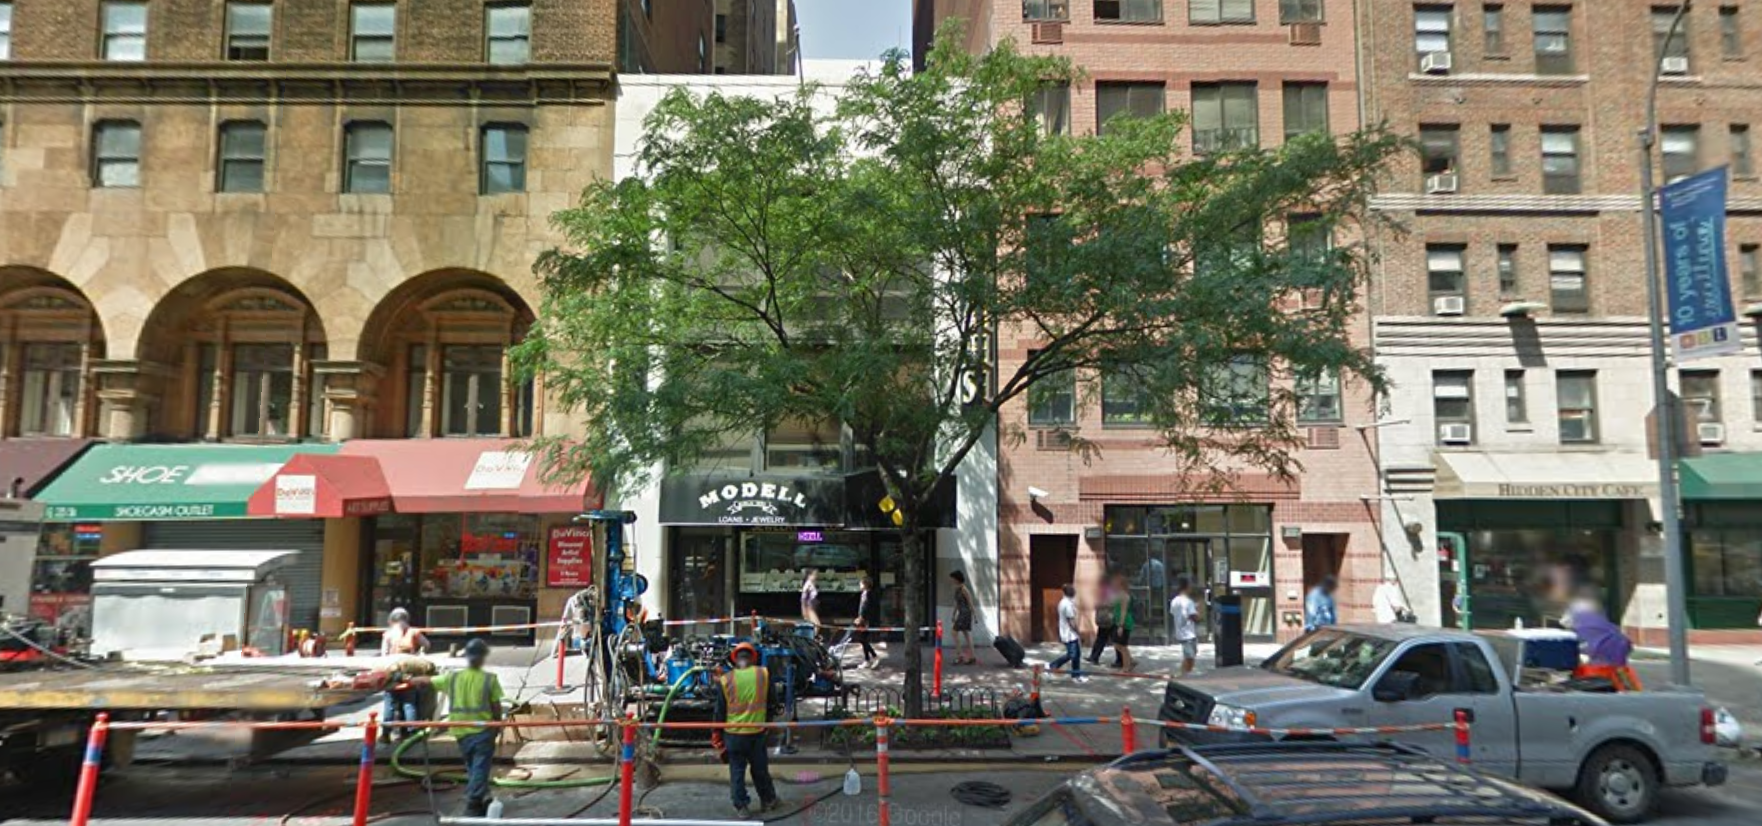 139 East 23rd Street, image via Google Maps